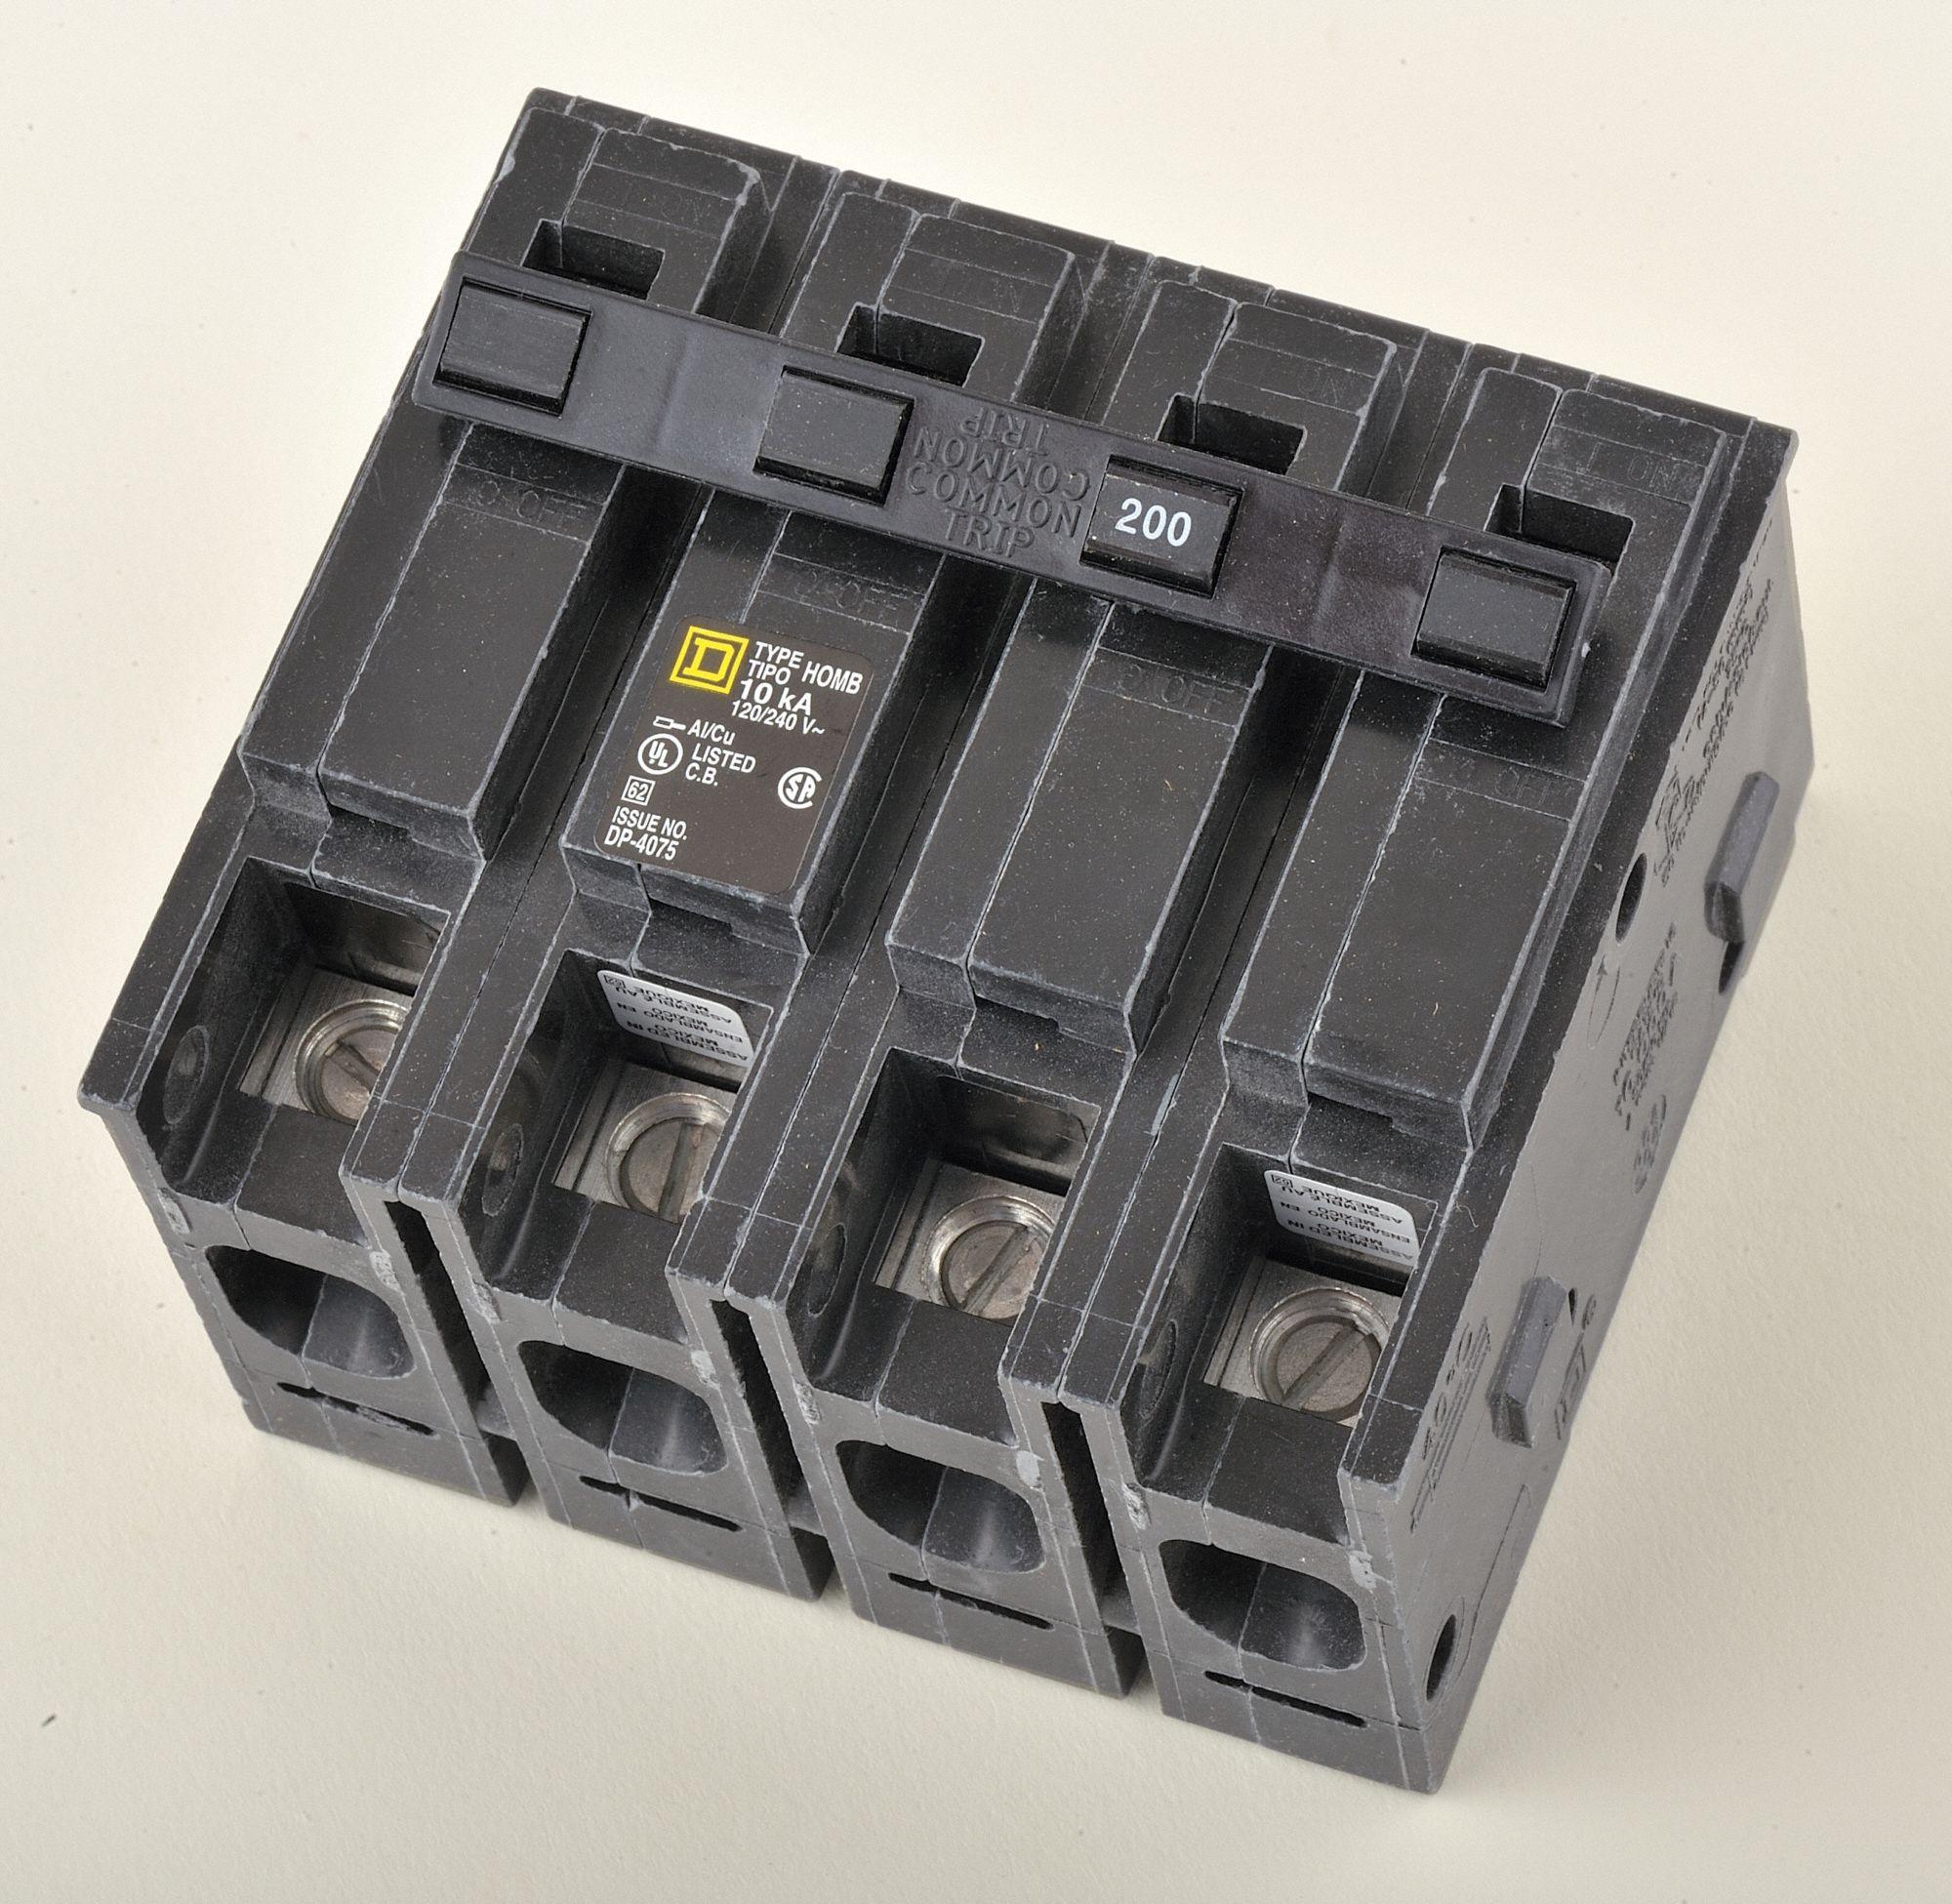 Hom2200bb Circuit Breaker Excellent Electrical Wiring Diagram House Image Library Hom2200 Square D Number Of Poles 4 200 Amps Standard Rh Grainger Com Qom2200vh